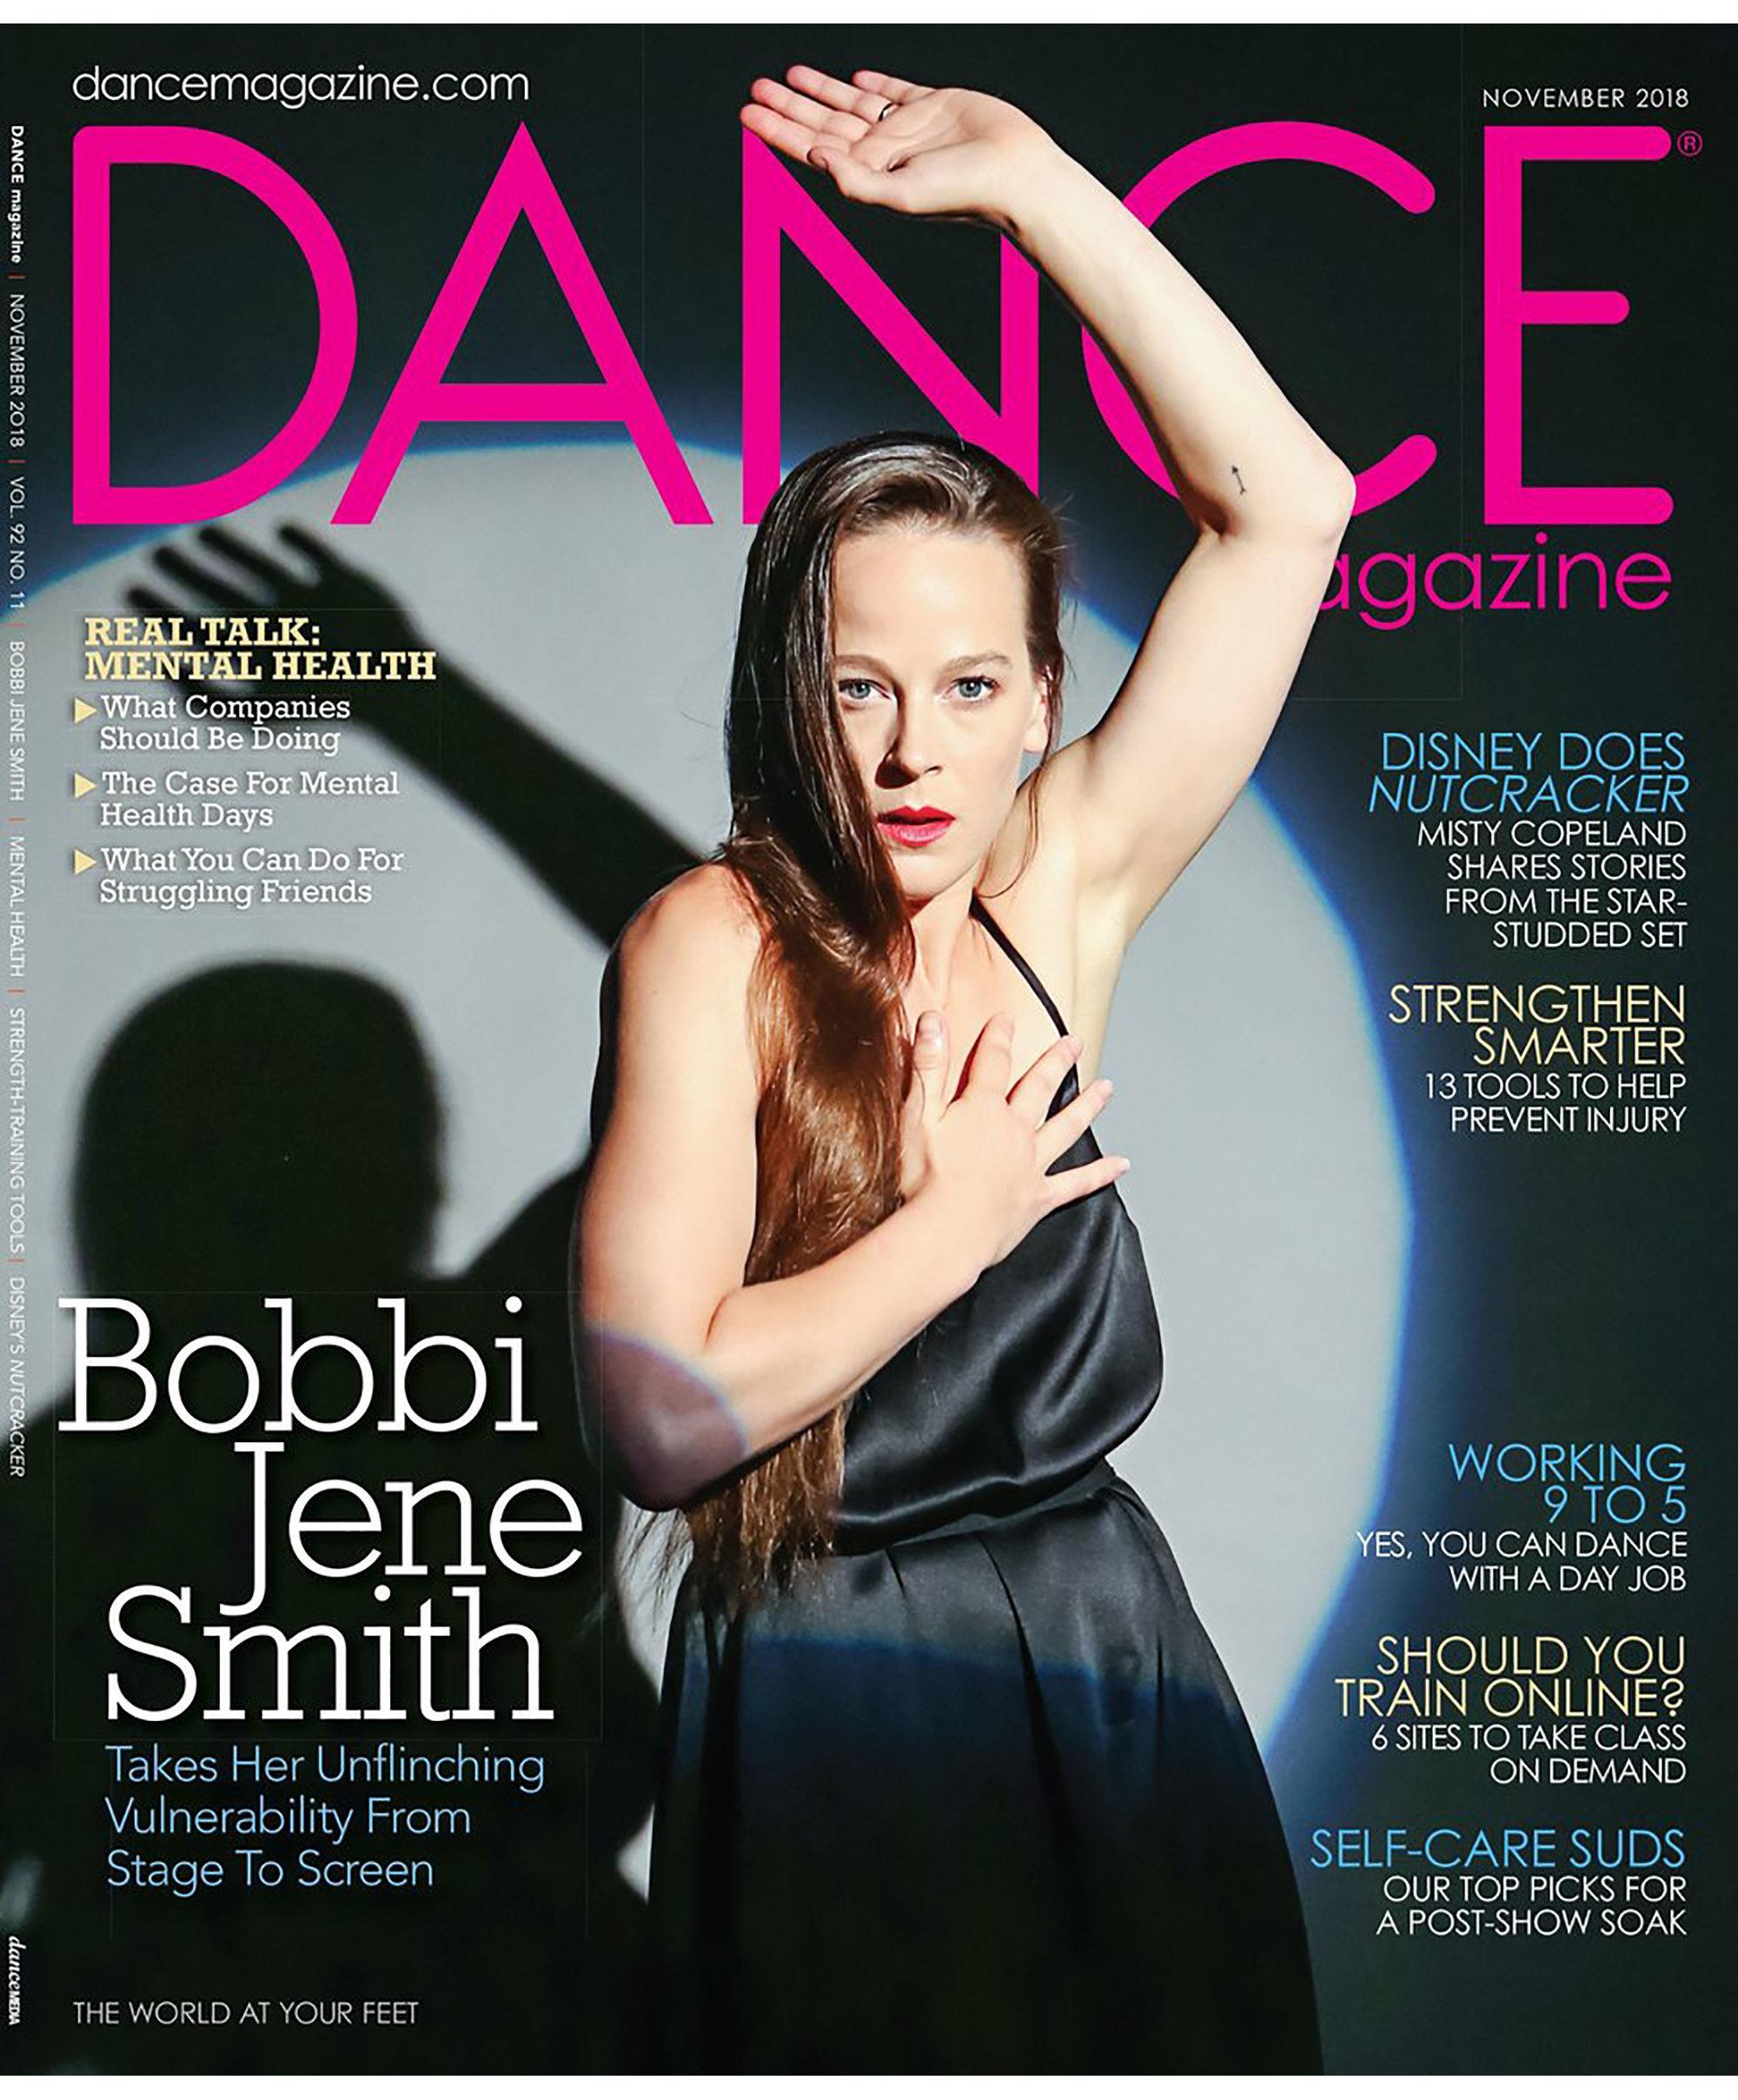 Bobbi Jene Smith on the cover of November's Dance Magazine.